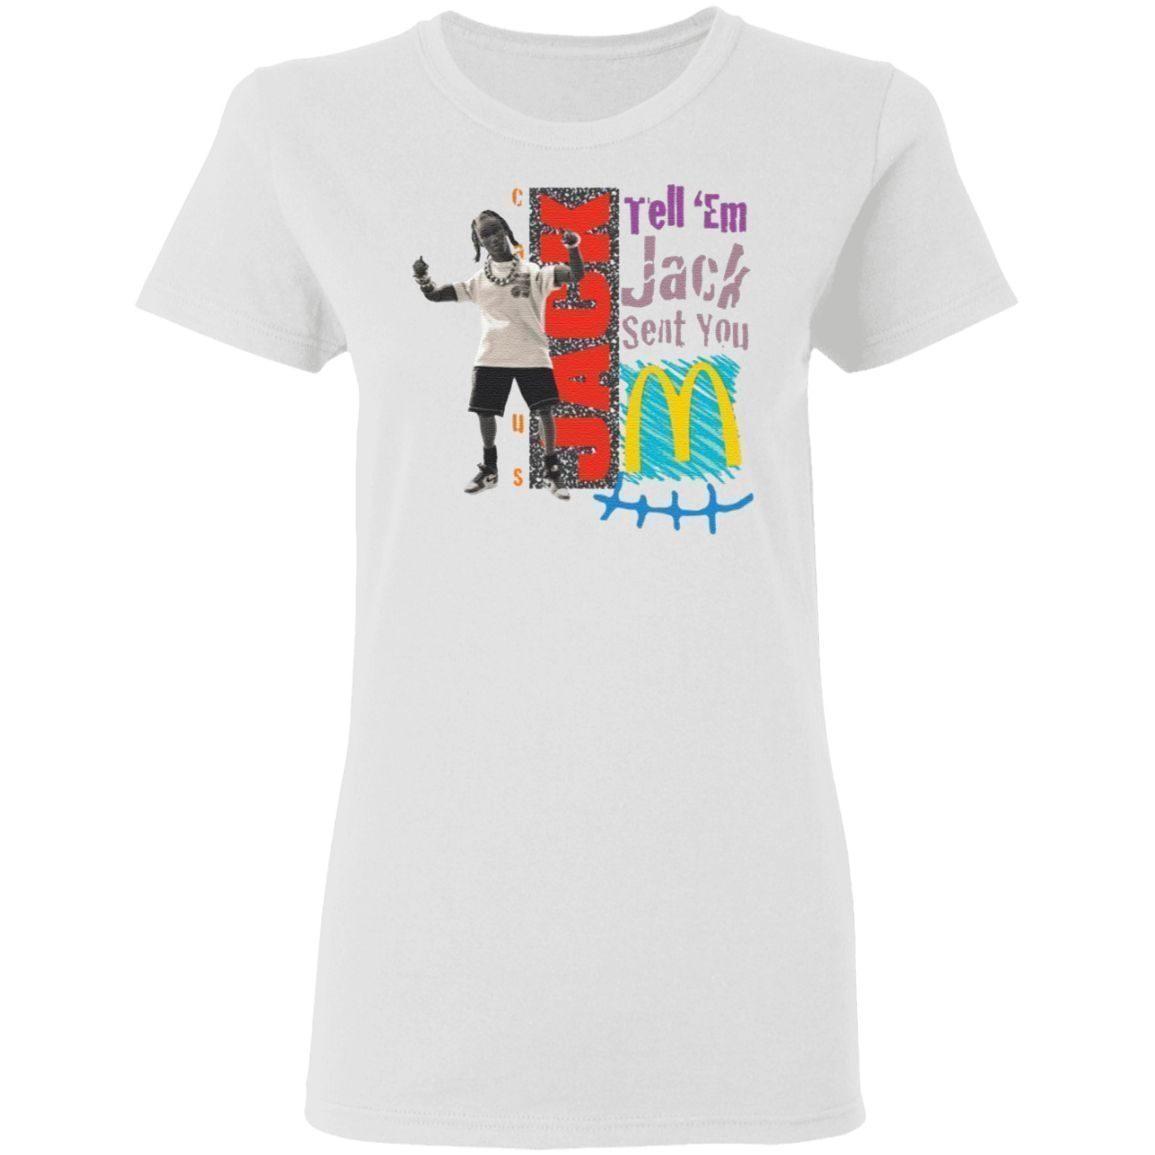 Travis Scott Drops Merch Jack Smile T-Shirt